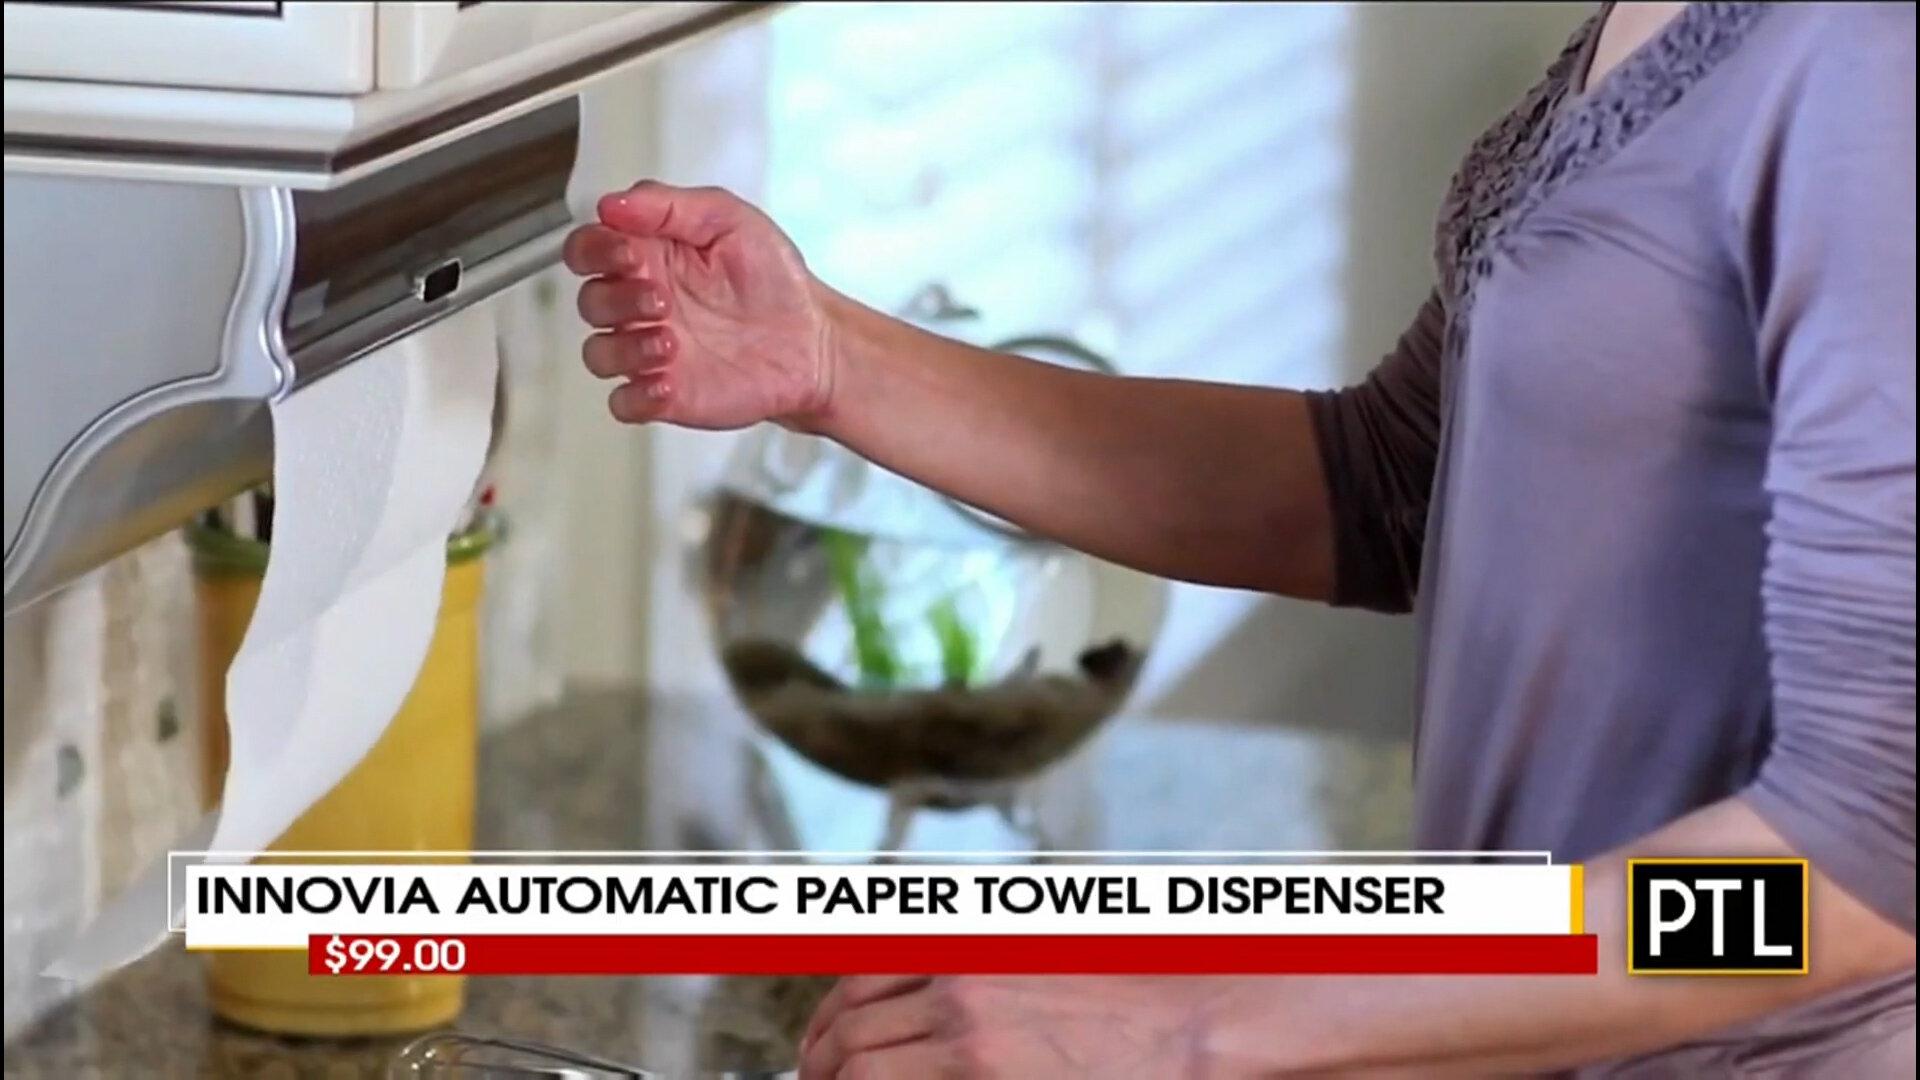 INNOVIA AUTOMATIC PAPER TOWEL DISPENSER - $99.00Shop Now